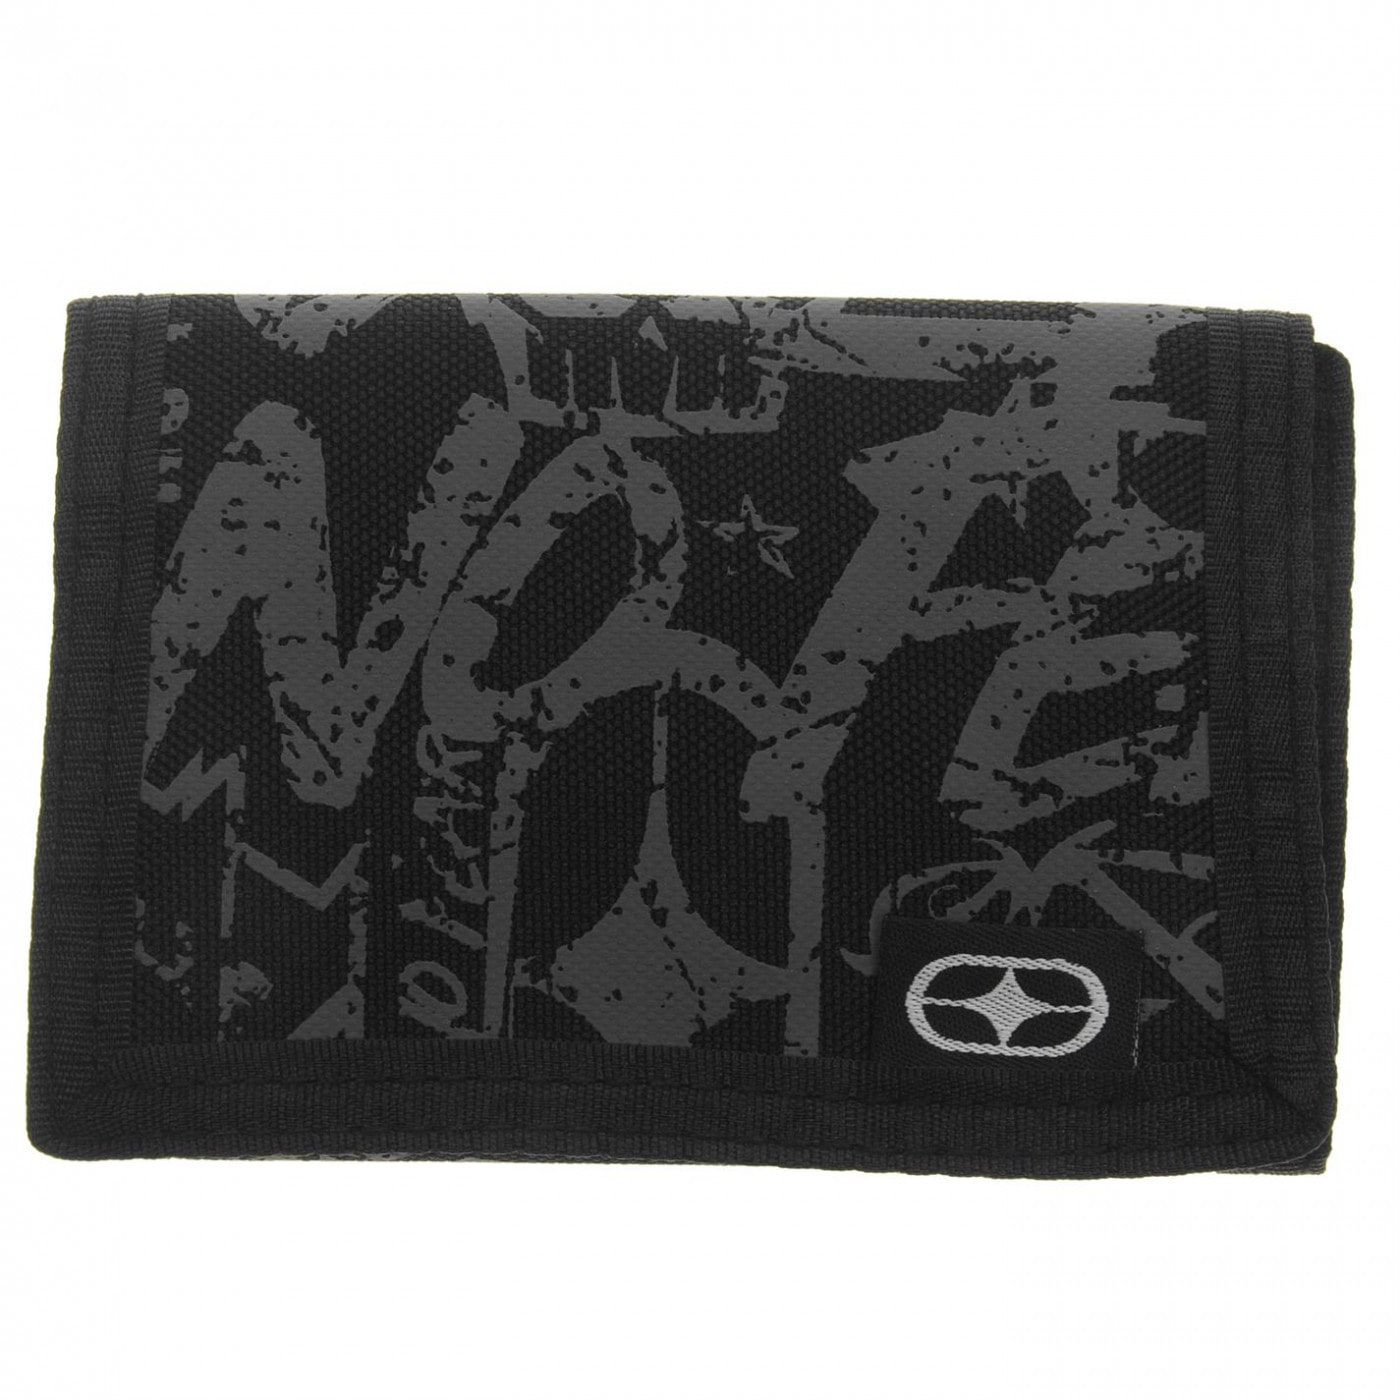 No Fear Graffiti Wallet